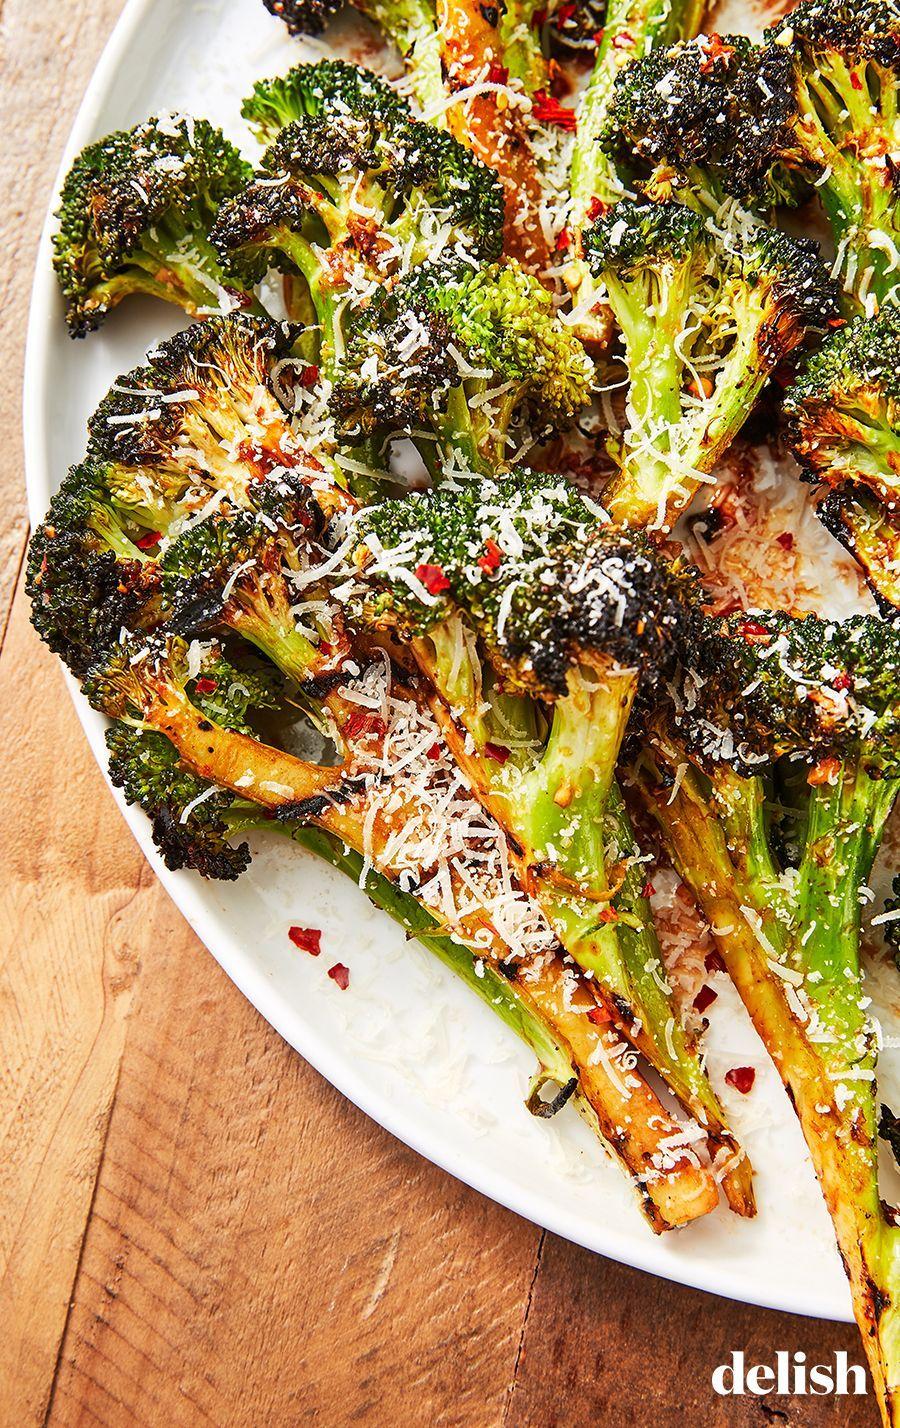 Photo of Grilled Broccoli #grillingrecipes Parm, honey, and garlic make broccoli infinite…